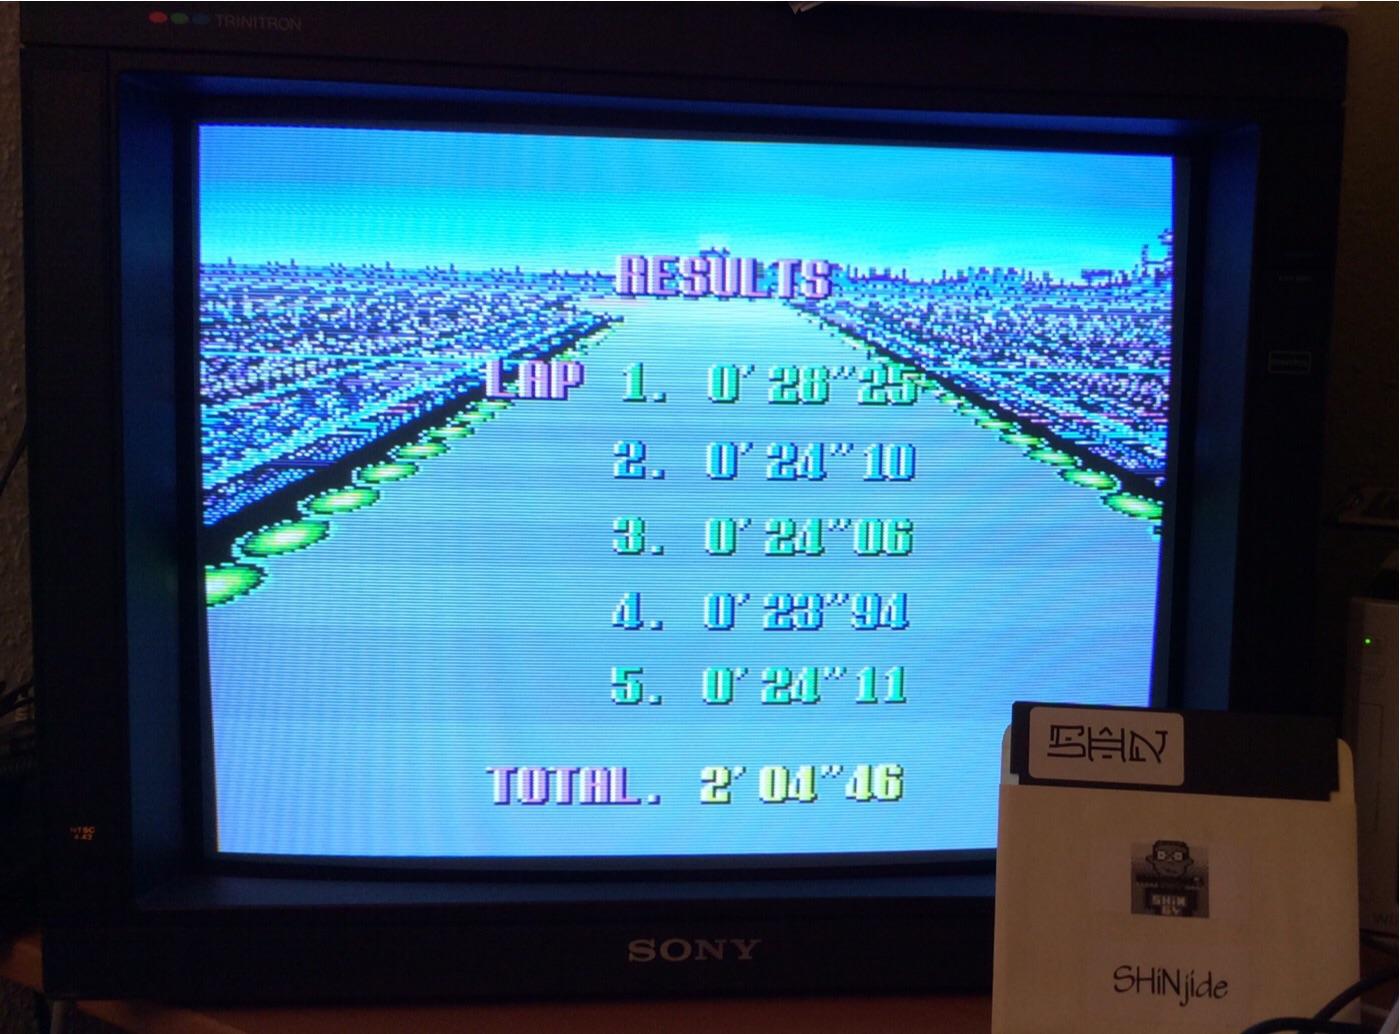 SHiNjide: F-Zero: Mute City I [Beginner] (SNES/Super Famicom Emulated) 0:02:04.46 points on 2014-12-23 11:20:31